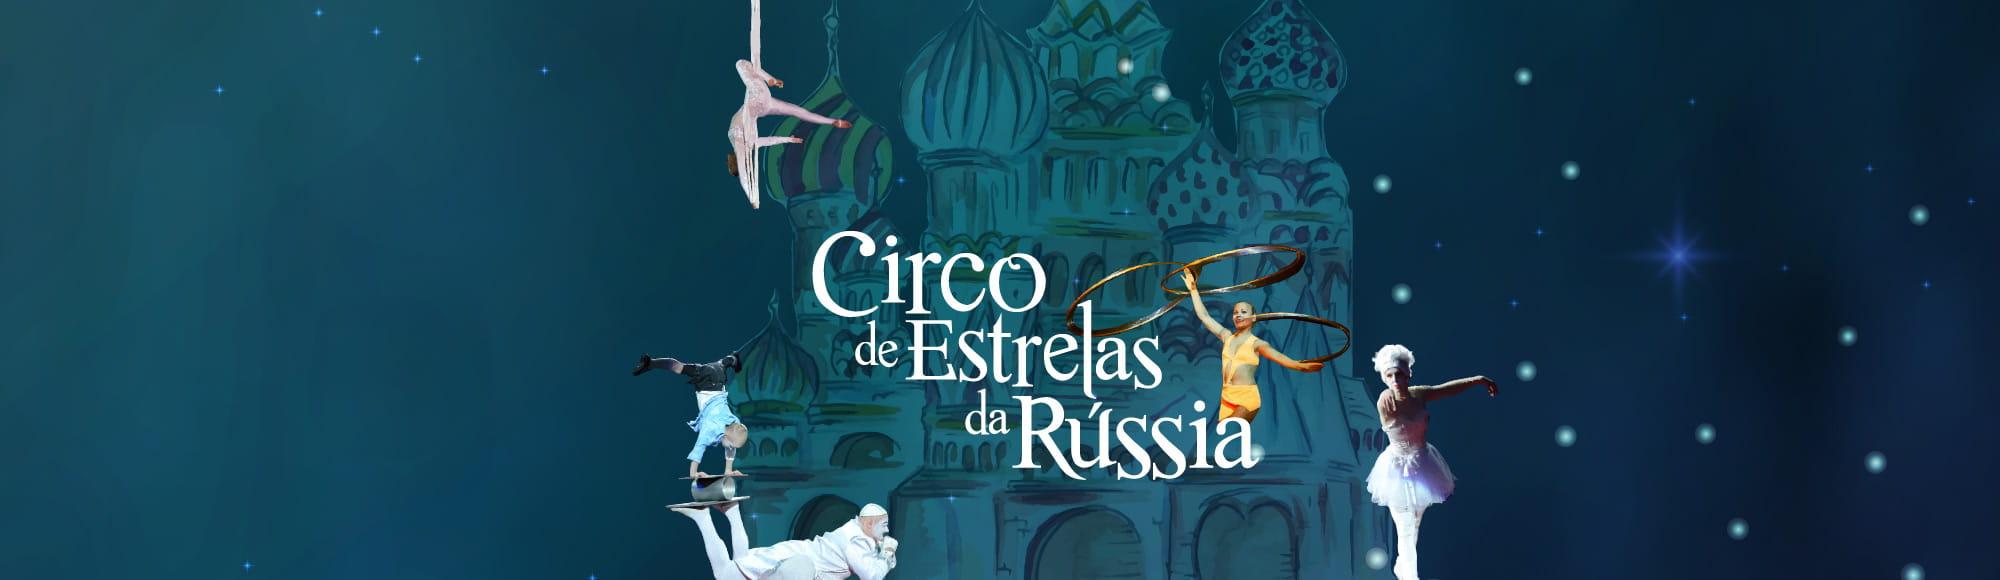 TV Catia fonseca dicas agenda cultural final de semana Circo das Estrelas